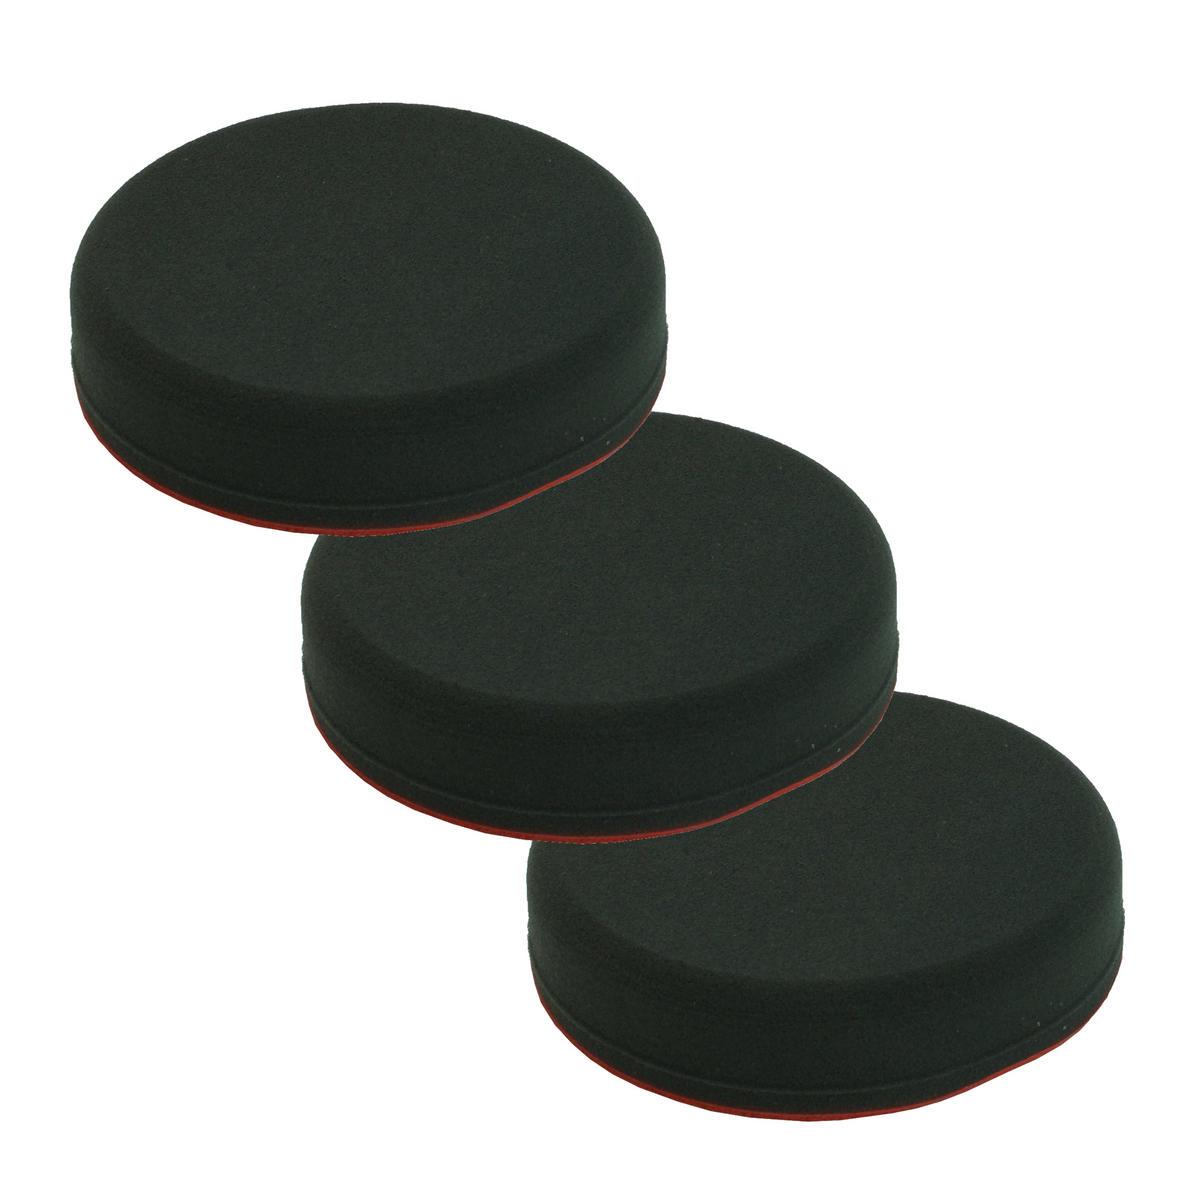 Car Cleaning 130mm Soft Black Velcro Polishing Cutting Detailing Mop Head x 3